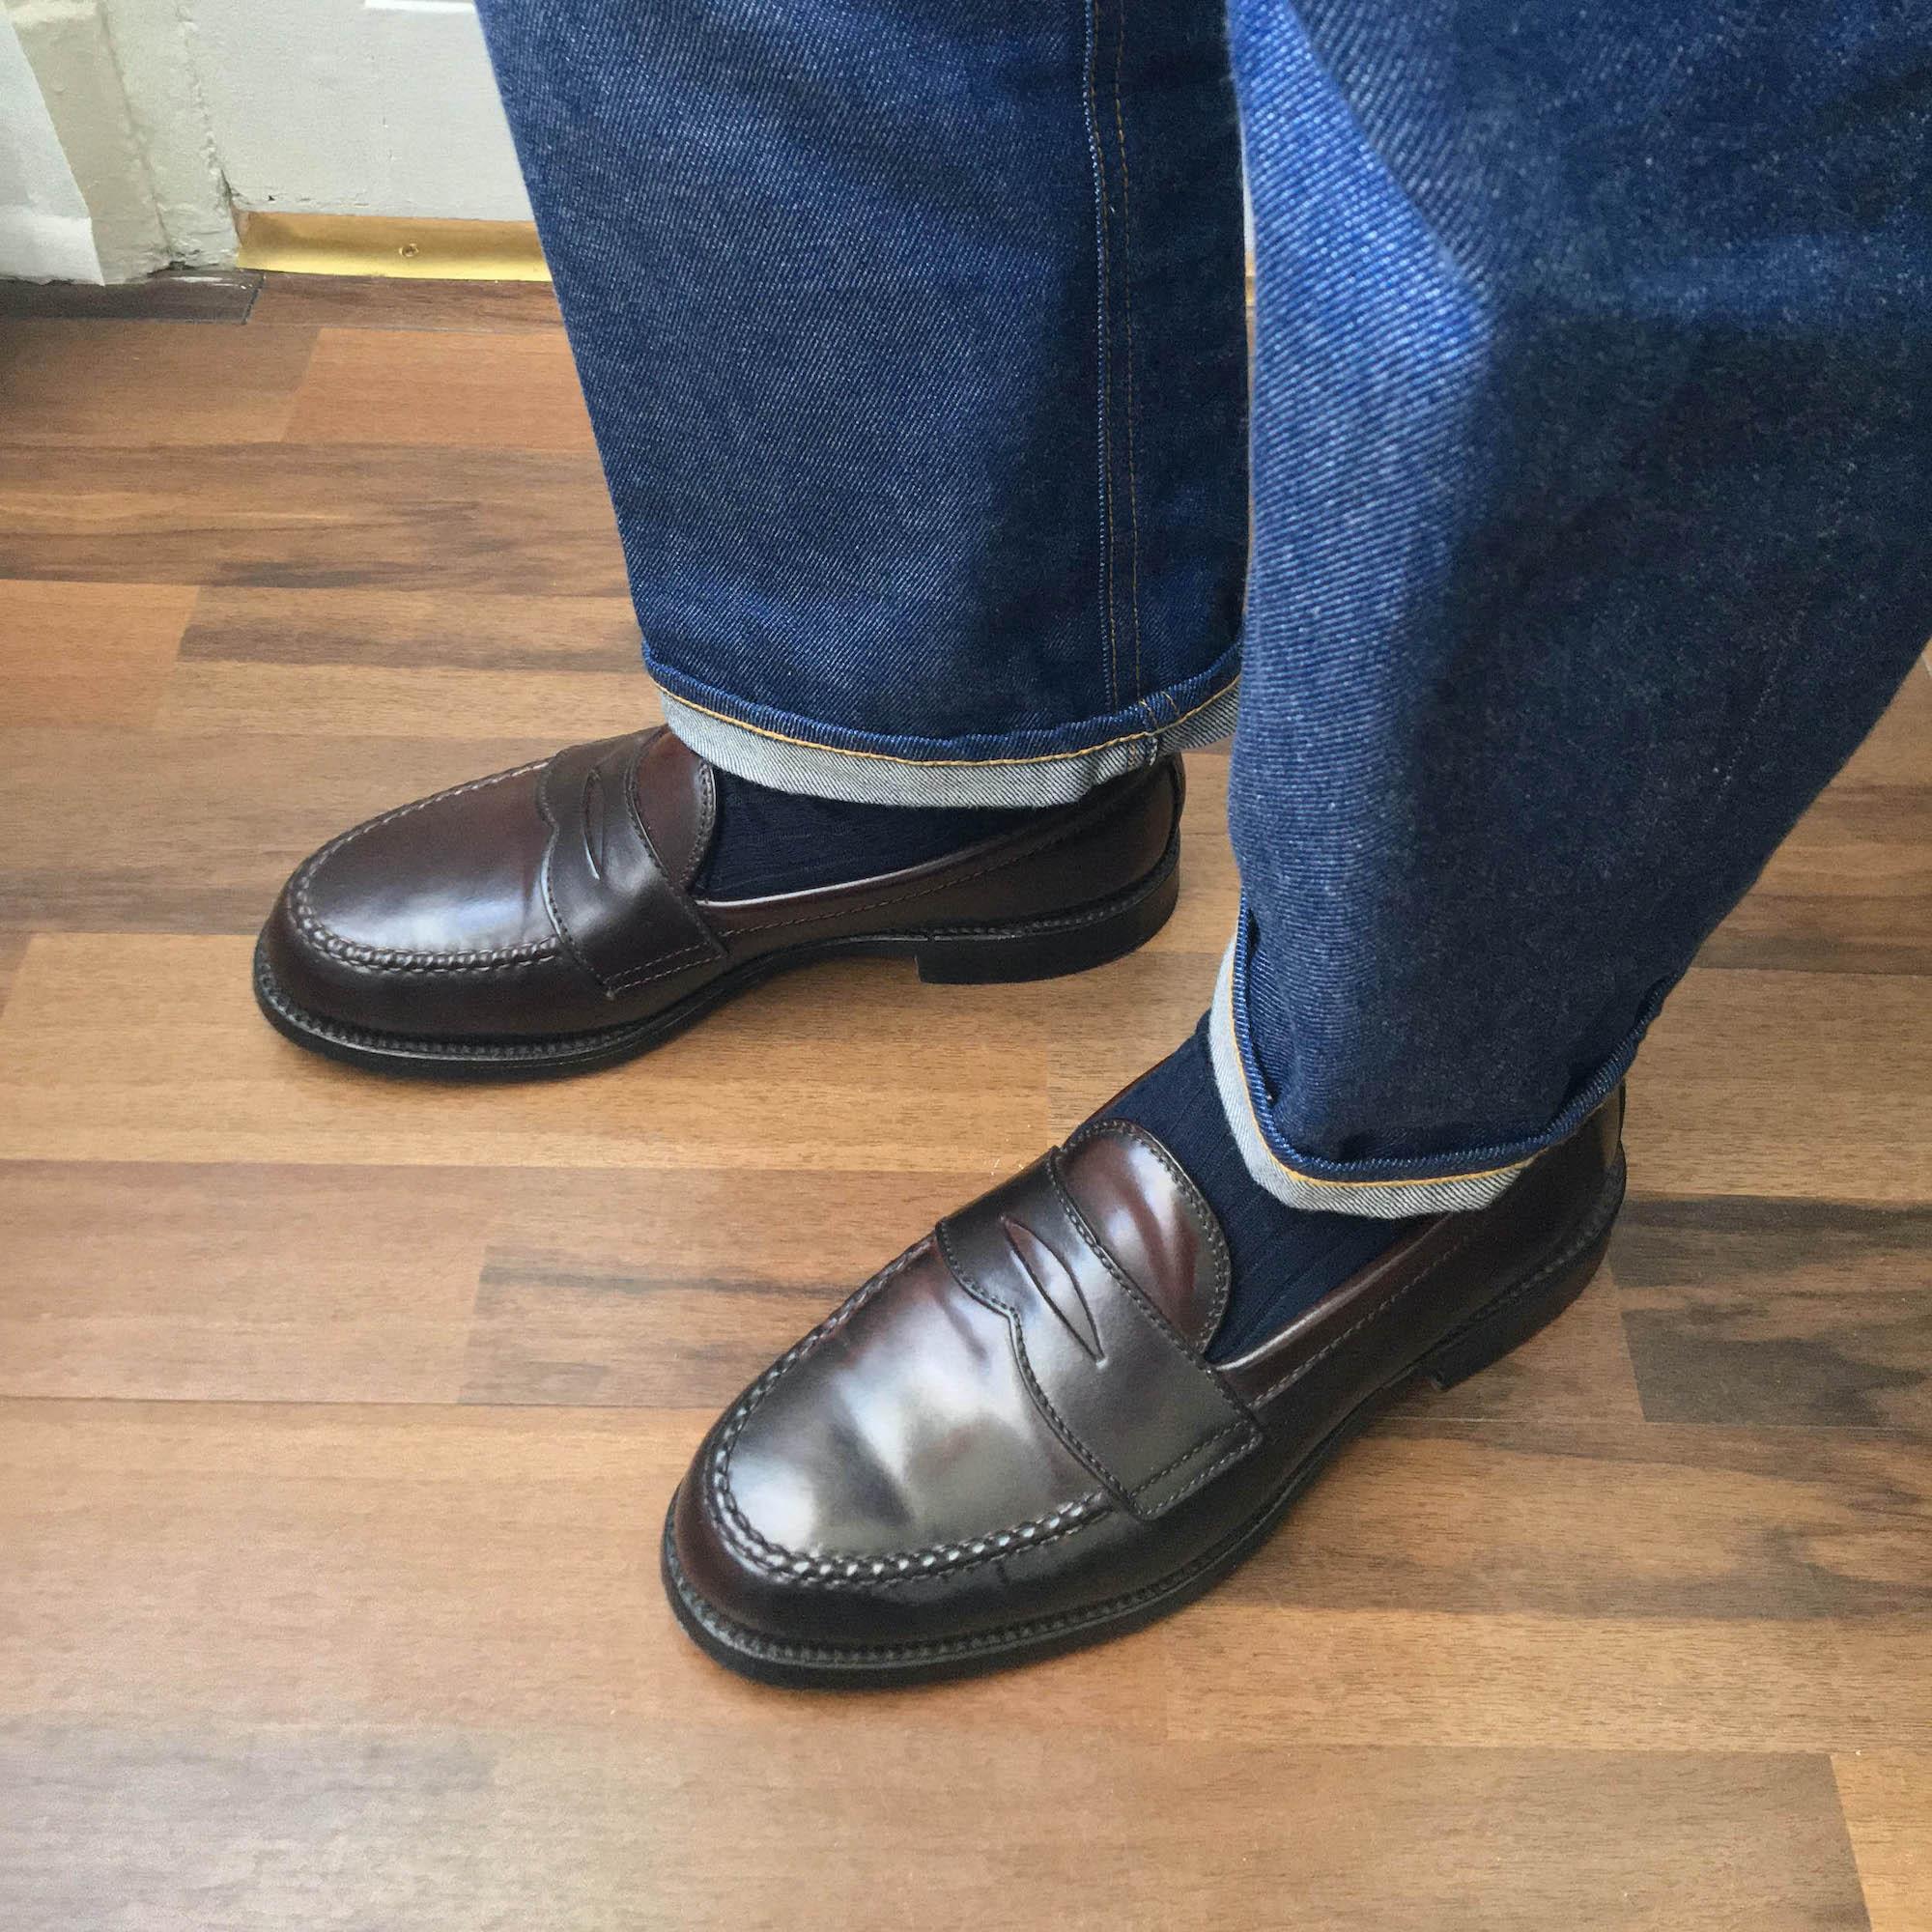 Alden Penny loafer 986 cordovan